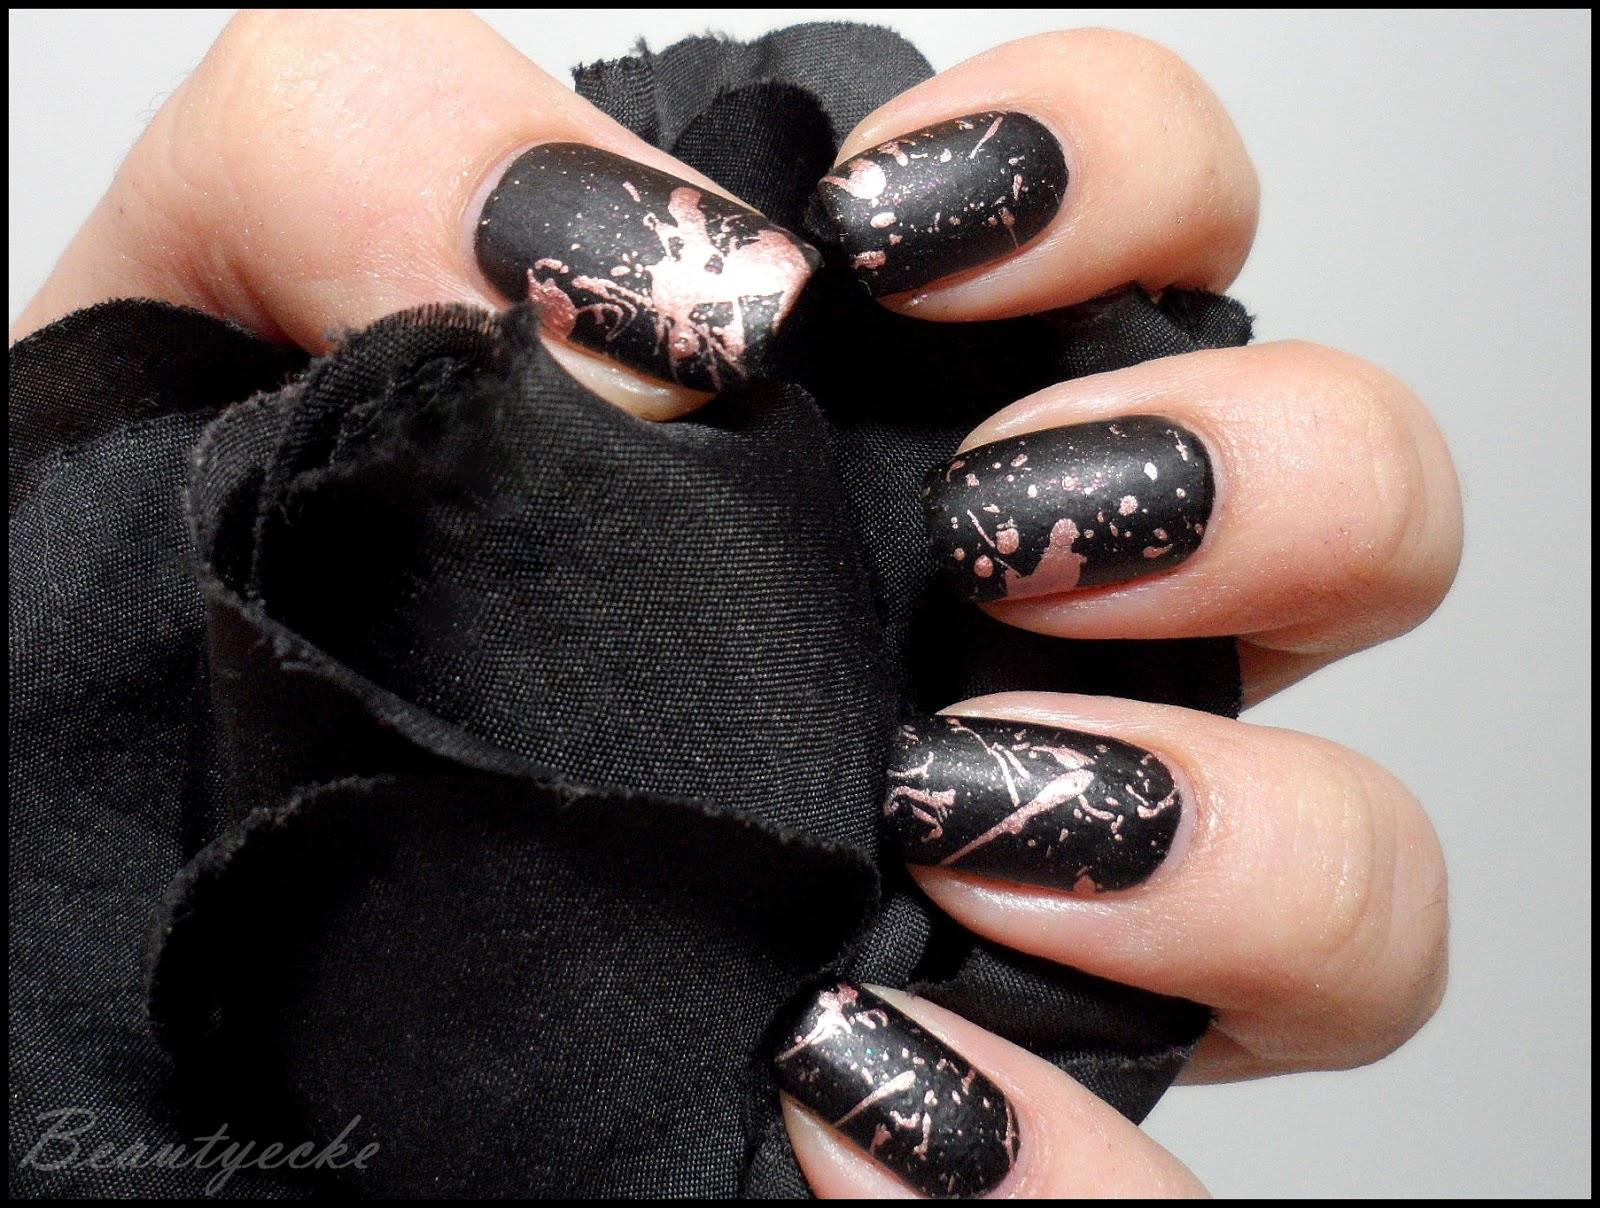 Beautyecke: splatter nails - Rumklecksen gewollt!